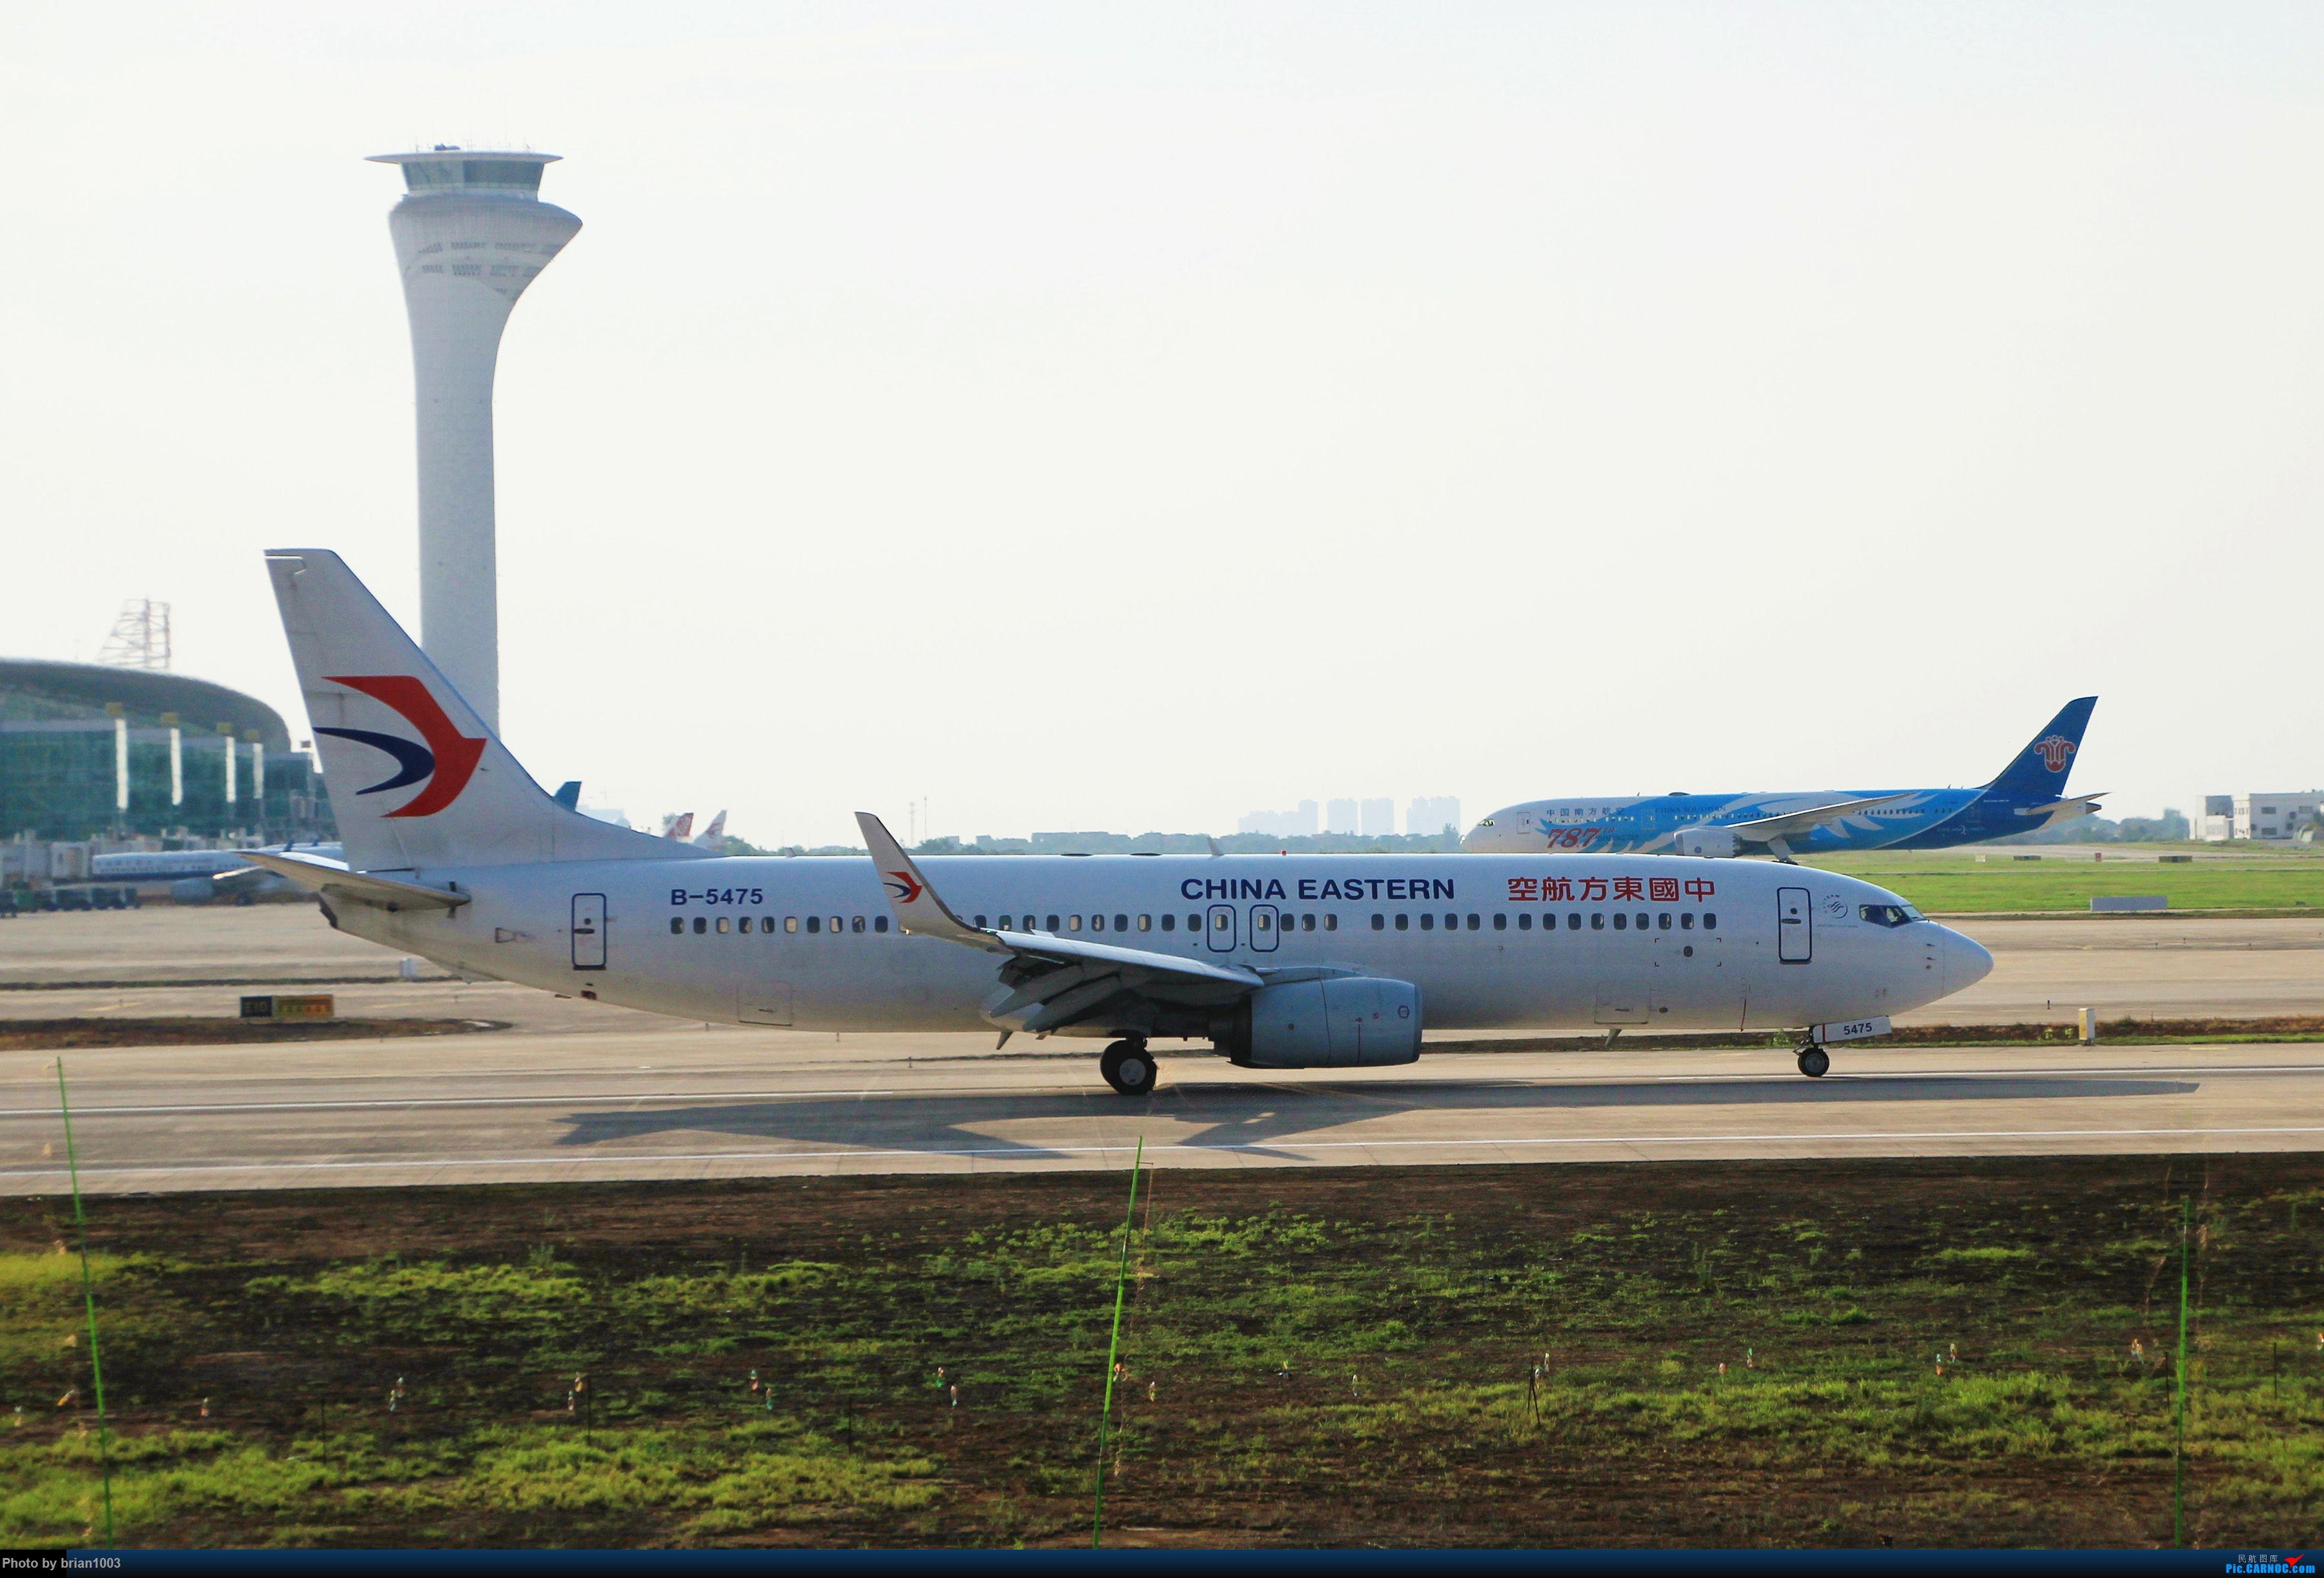 Re:[原创]WUH武汉天河机场拍机之喜迎纽约直飞 BOEING 737-800 B-5475 中国武汉天河国际机场